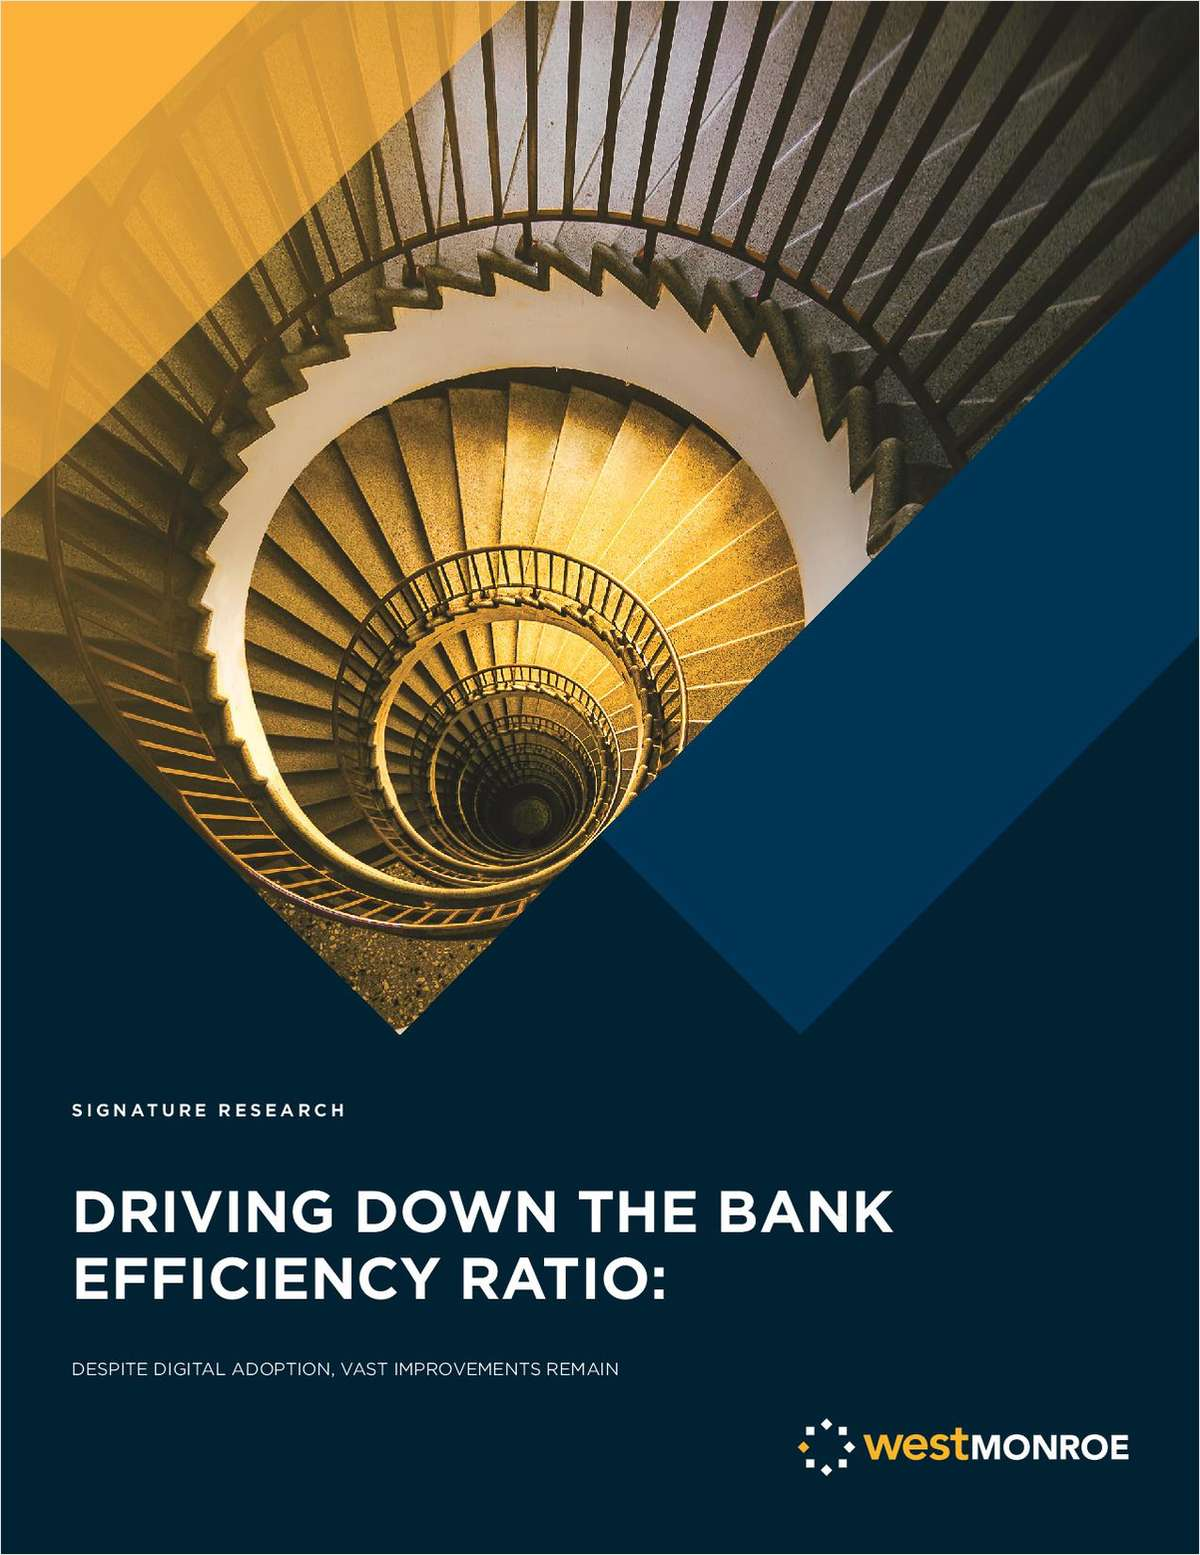 Driving Down the Bank Efficiency Ratio: Despite Digital Adoption, Vast Improvements Remain